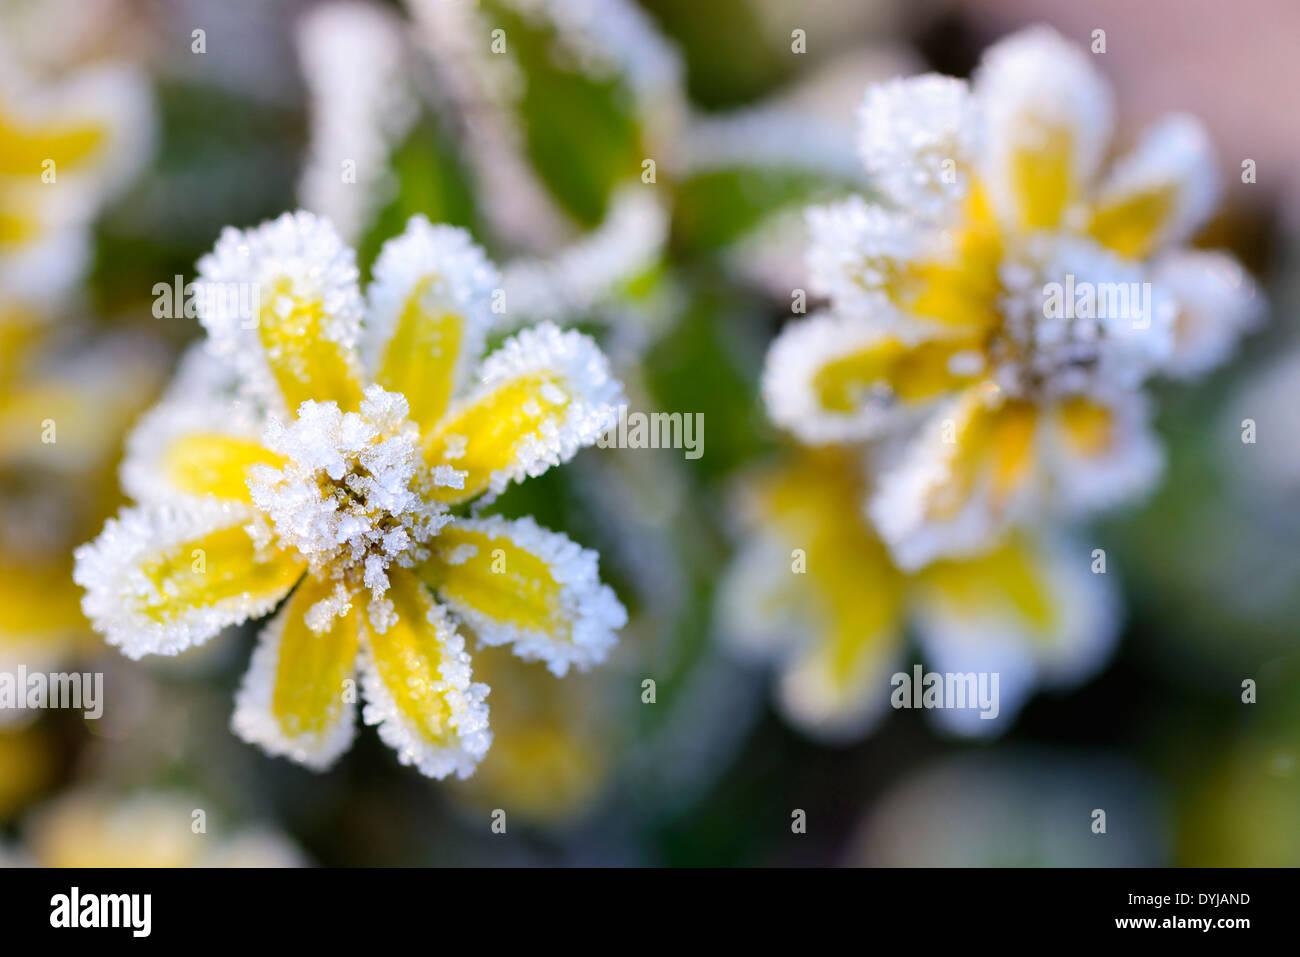 Sanvitalia procumbens, Mexican creeping zinnia, in Autumn, Husarenknopf (Sanvitalia speciosa) mit Raureif, Frost - Stock Image